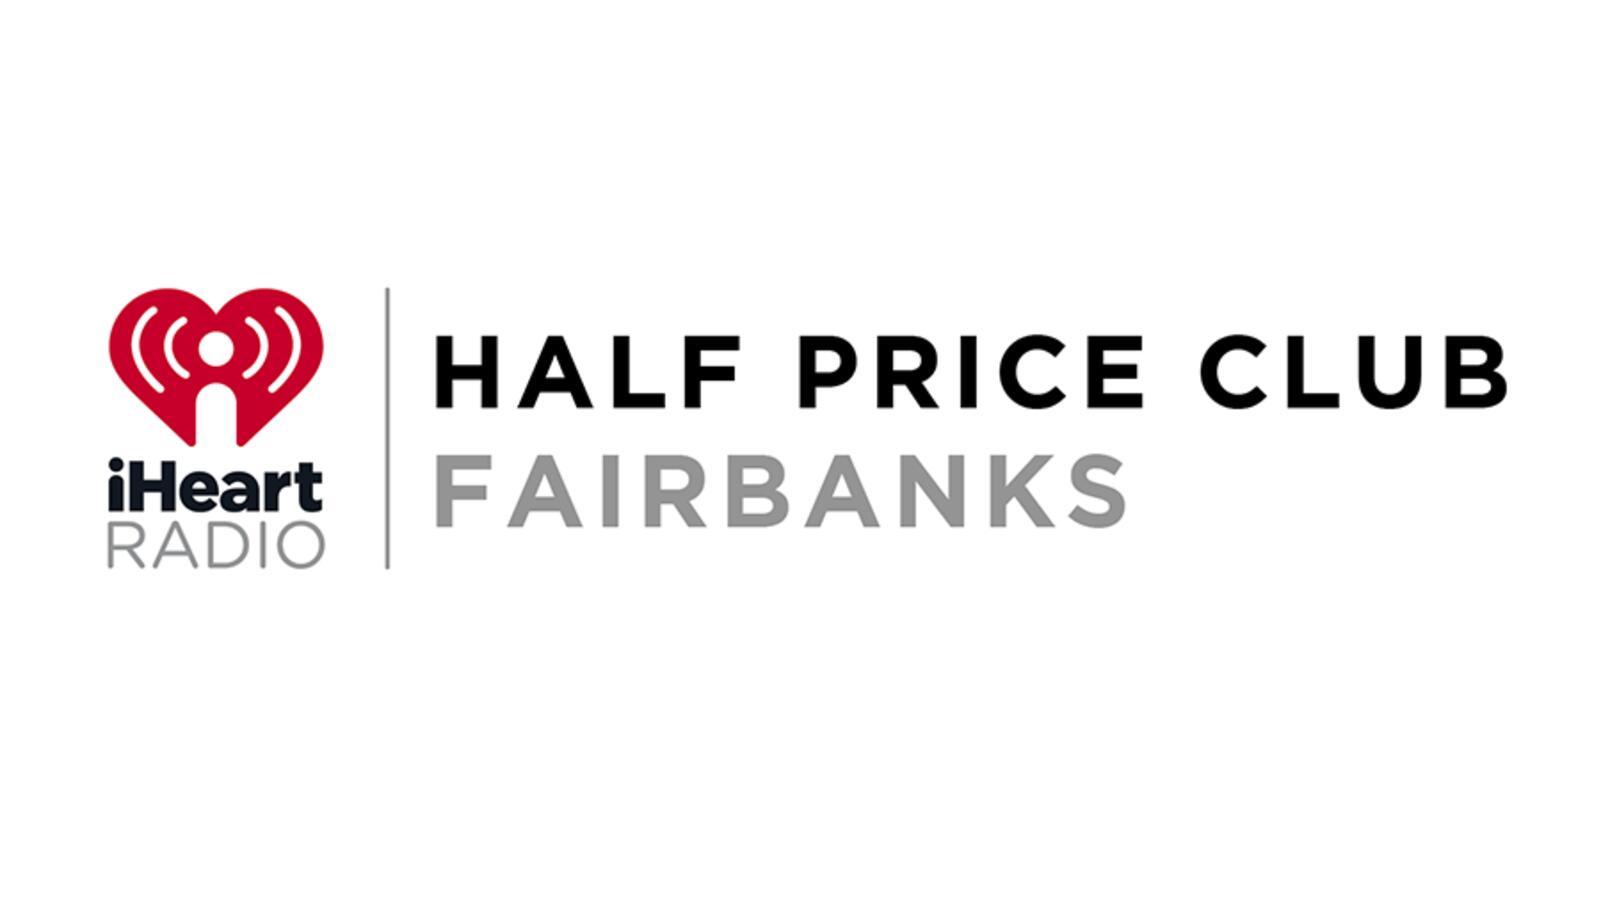 HALF PRICE CLUB